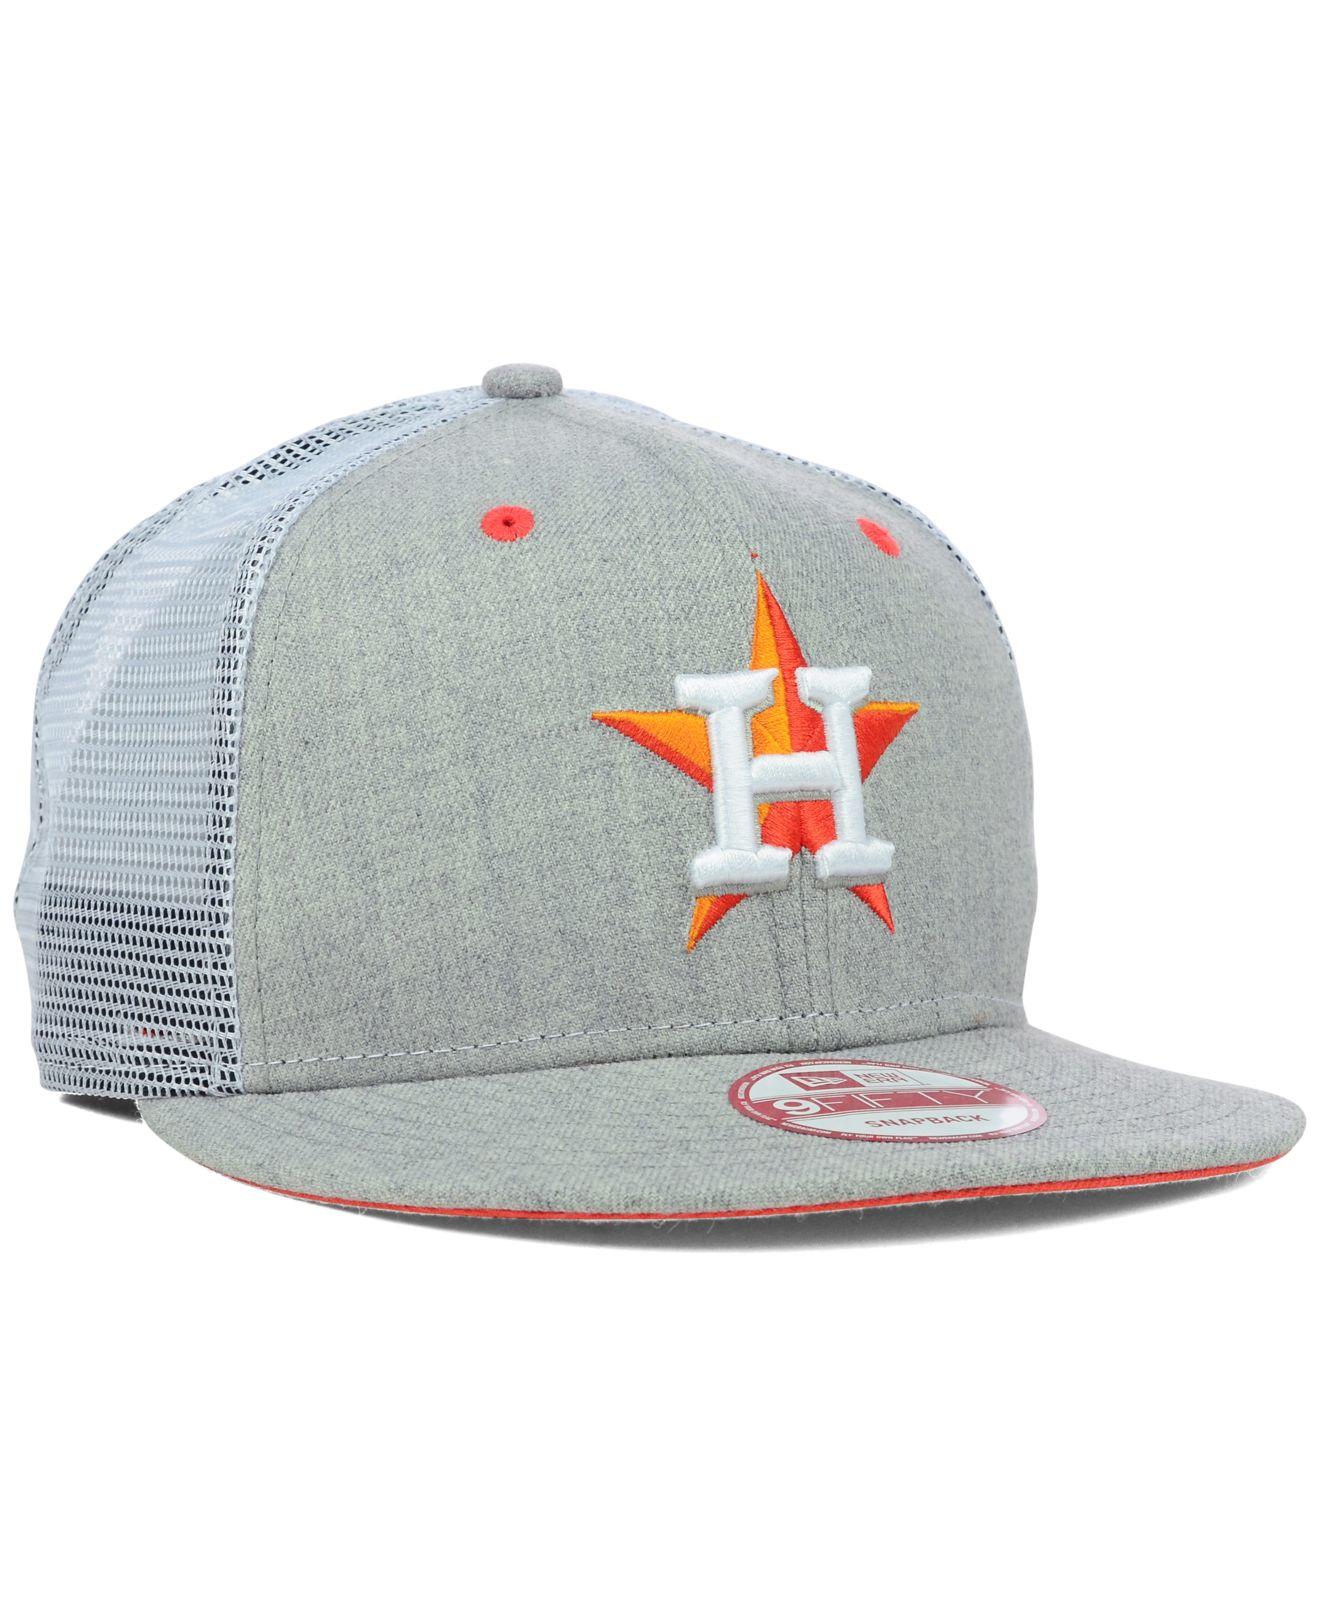 wholesale dealer 04711 dad6d ... australia lyst ktz houston astros heather trucker 9fifty snapback cap in  aa7e3 3ec2e ...